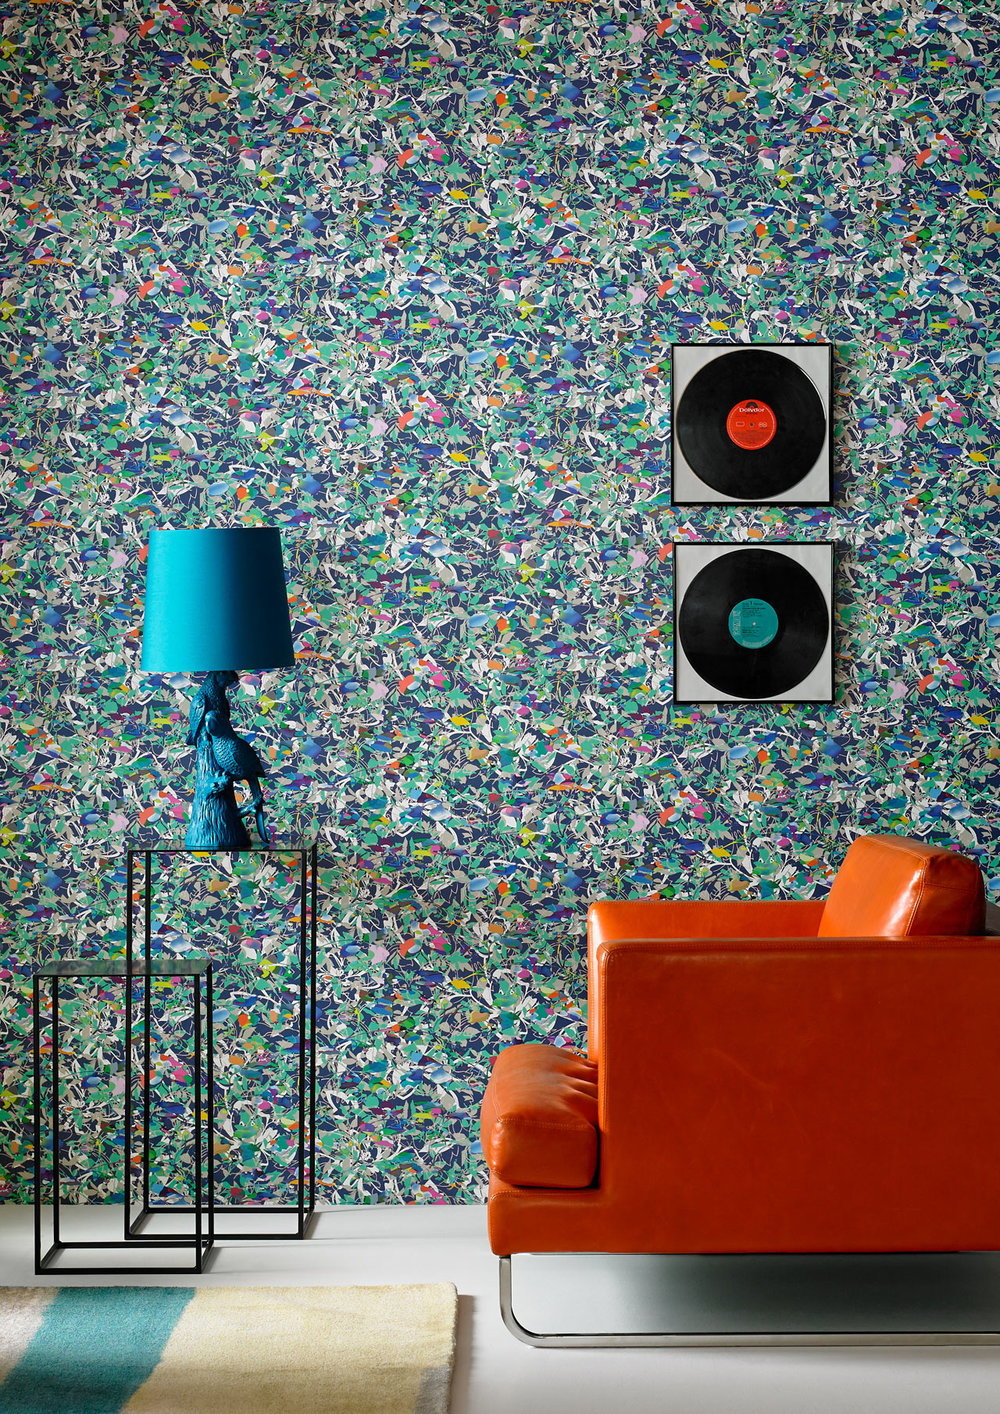 Graham-Brown-Brian-Eno-Flower-Mask-wallpaper-1.jpg